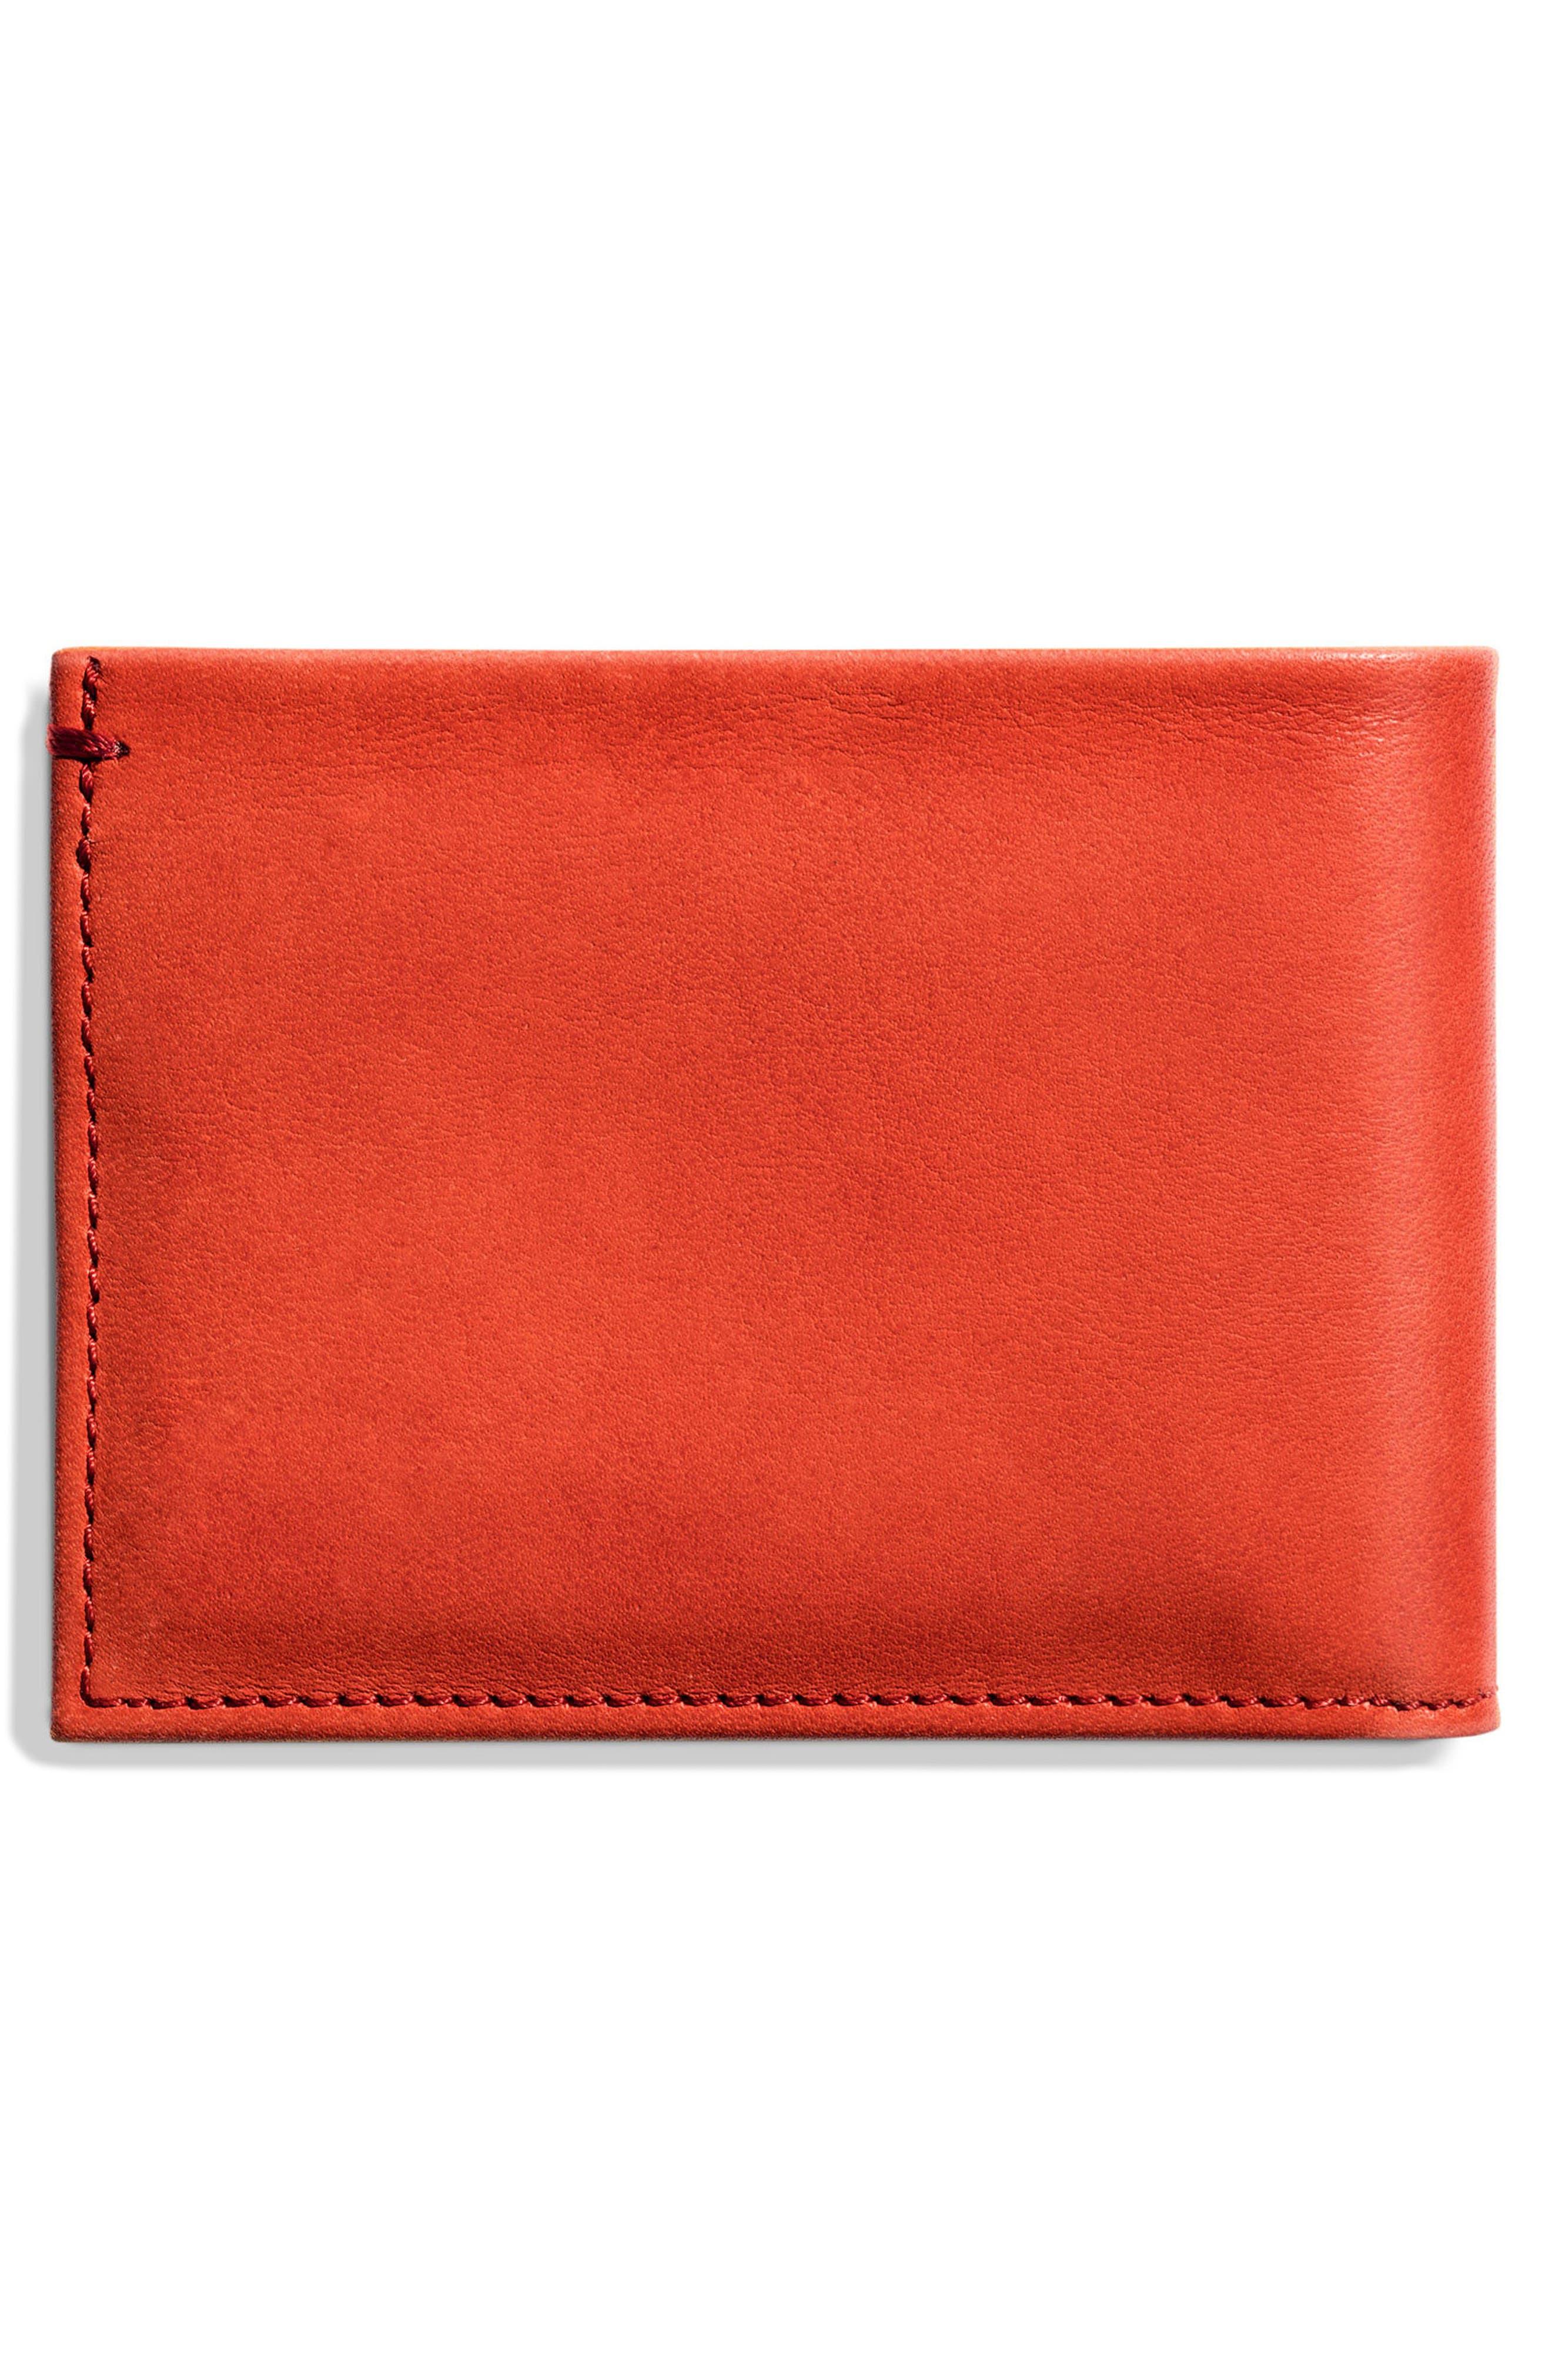 Alternate Image 3  - Shinola Slim Bifold Leather Wallet